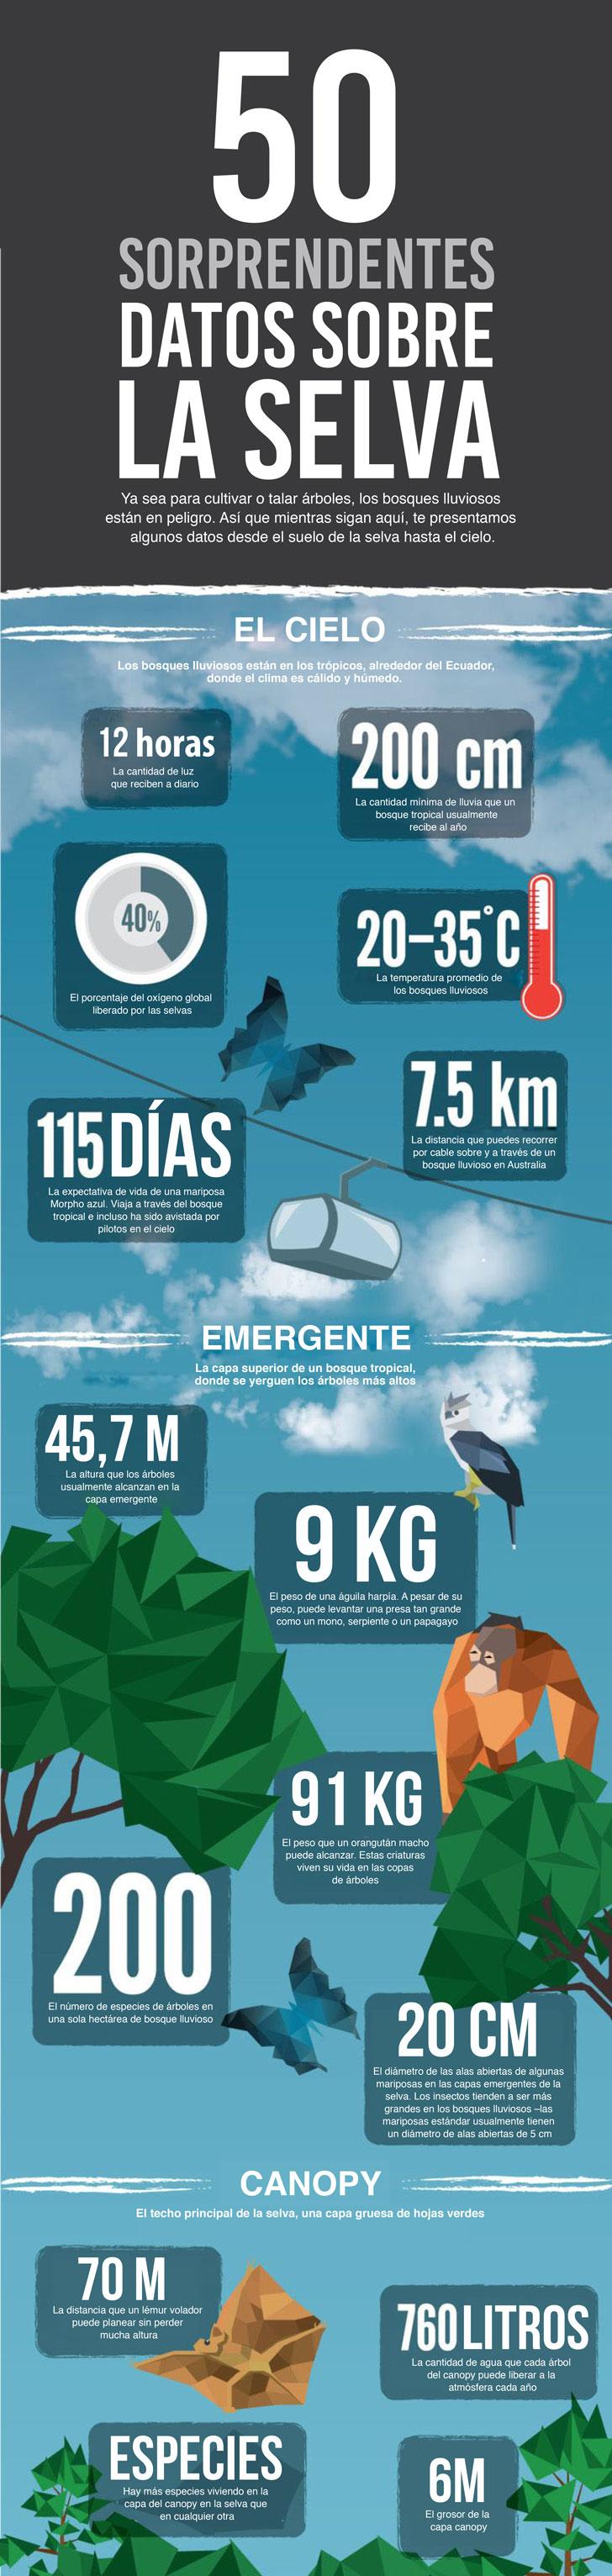 50 sorprendentes datos sobre la selva que te impactarán